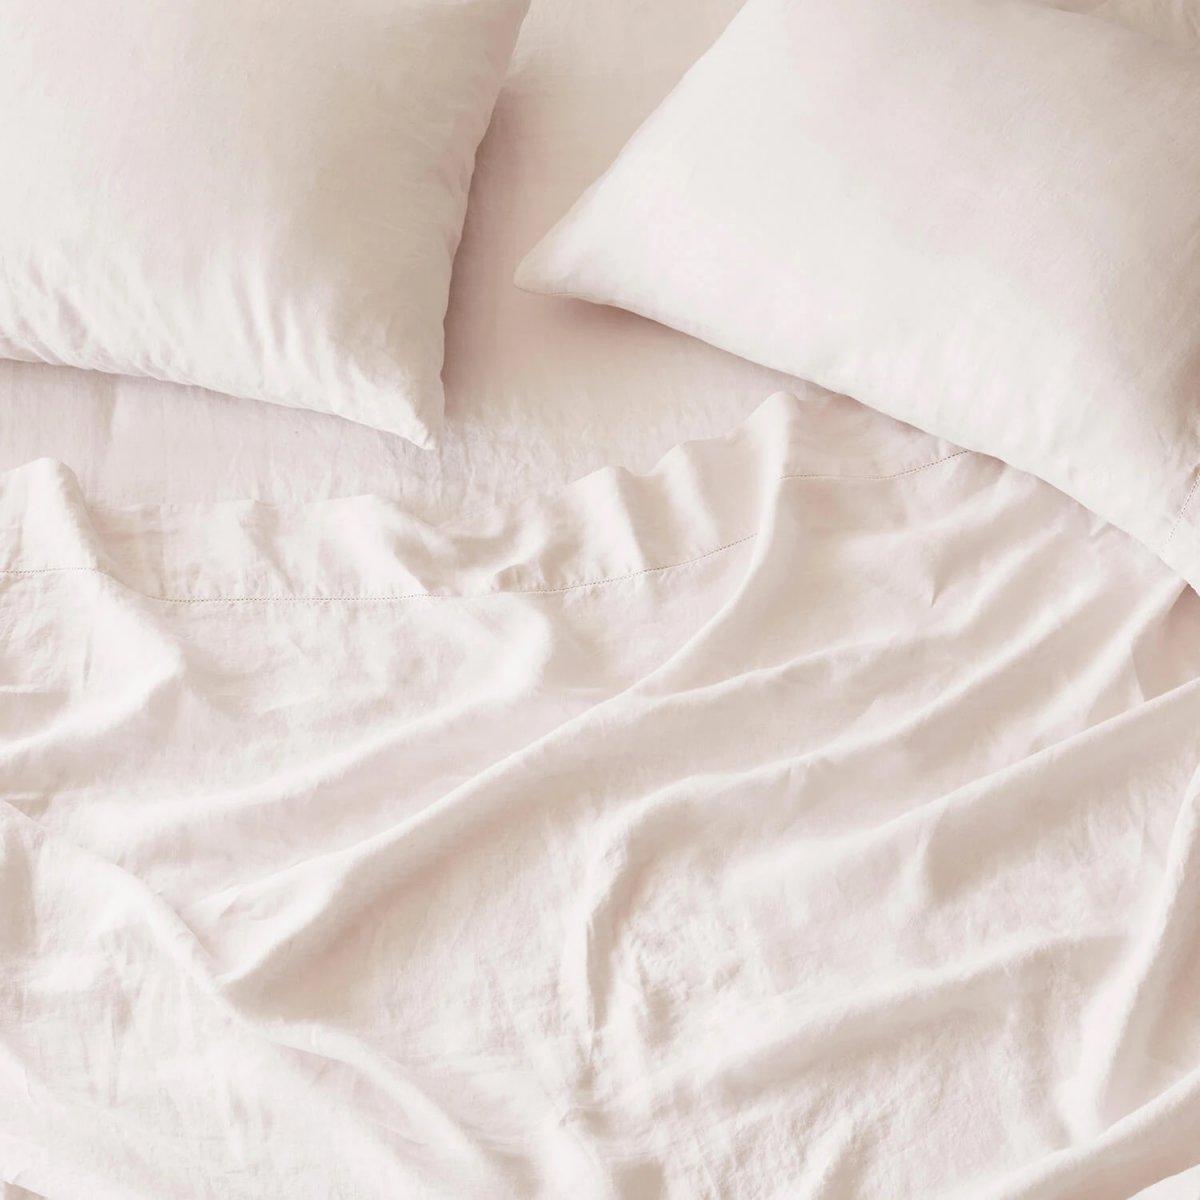 Stonewashed Linen Bed Bundle, blush.